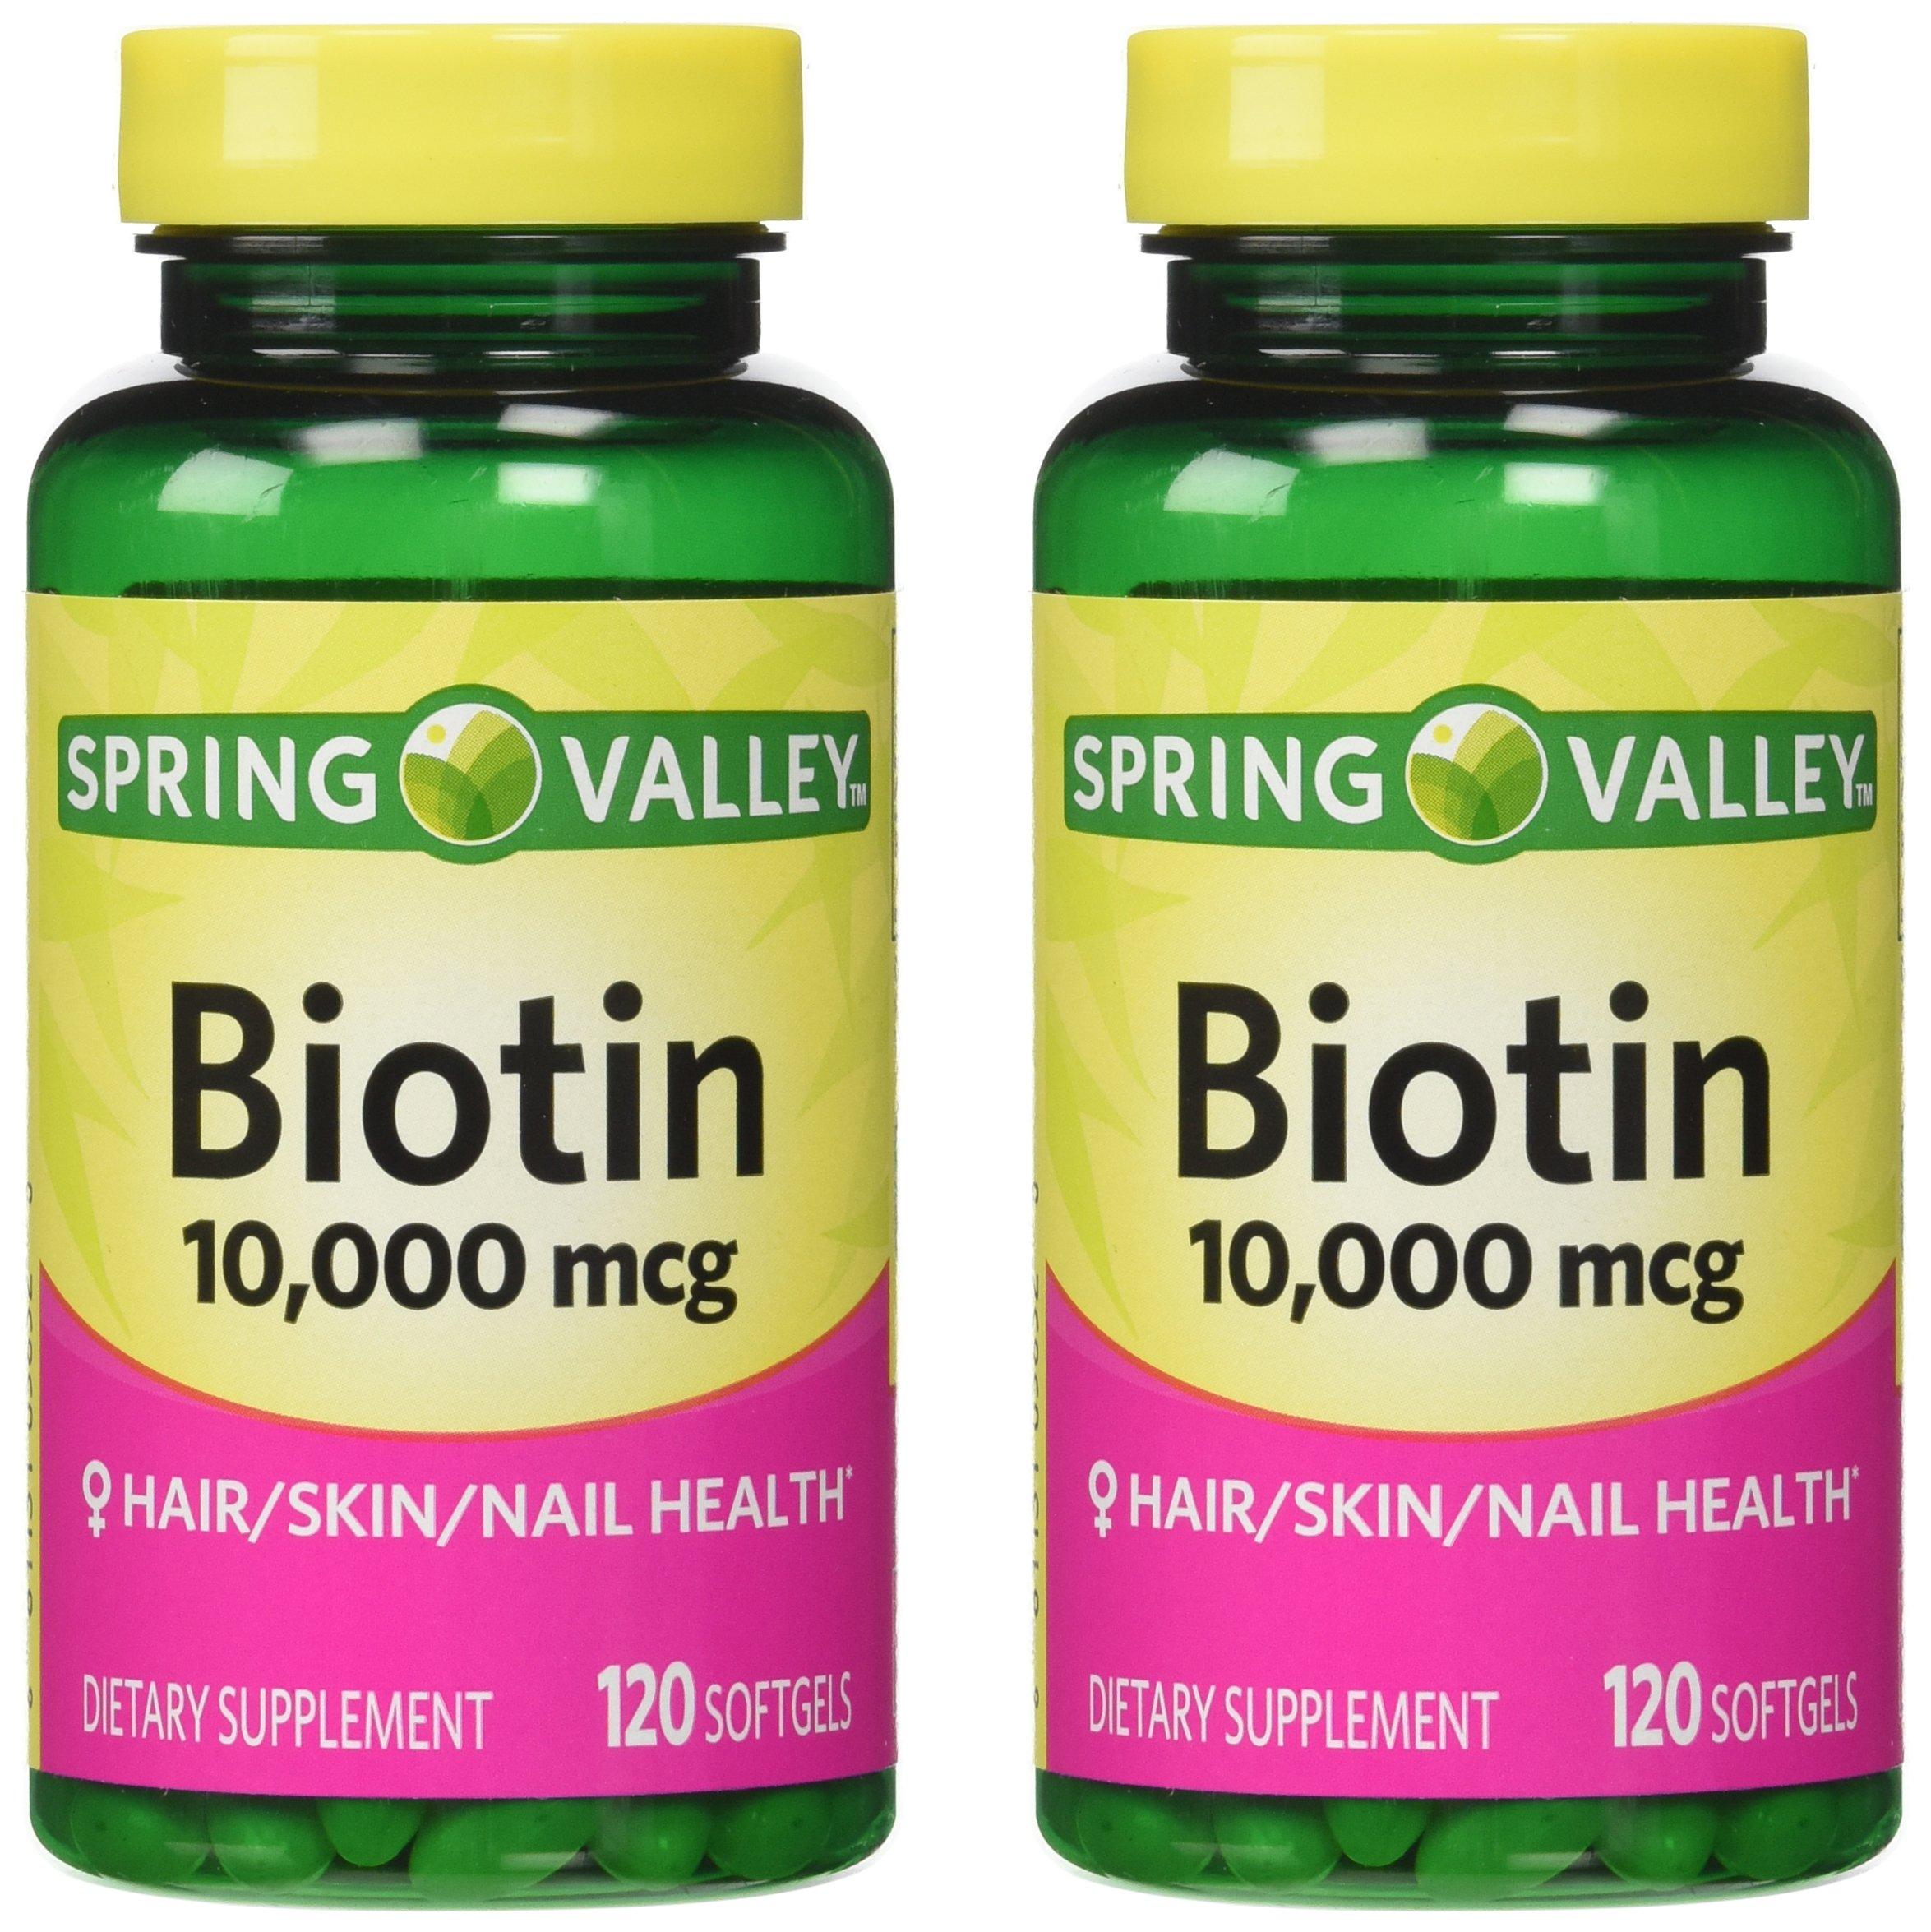 Spring Valley Biotin 10,000 mcg, 2 Bottles of 120 Softgels (2 Pack) by Spring Valley